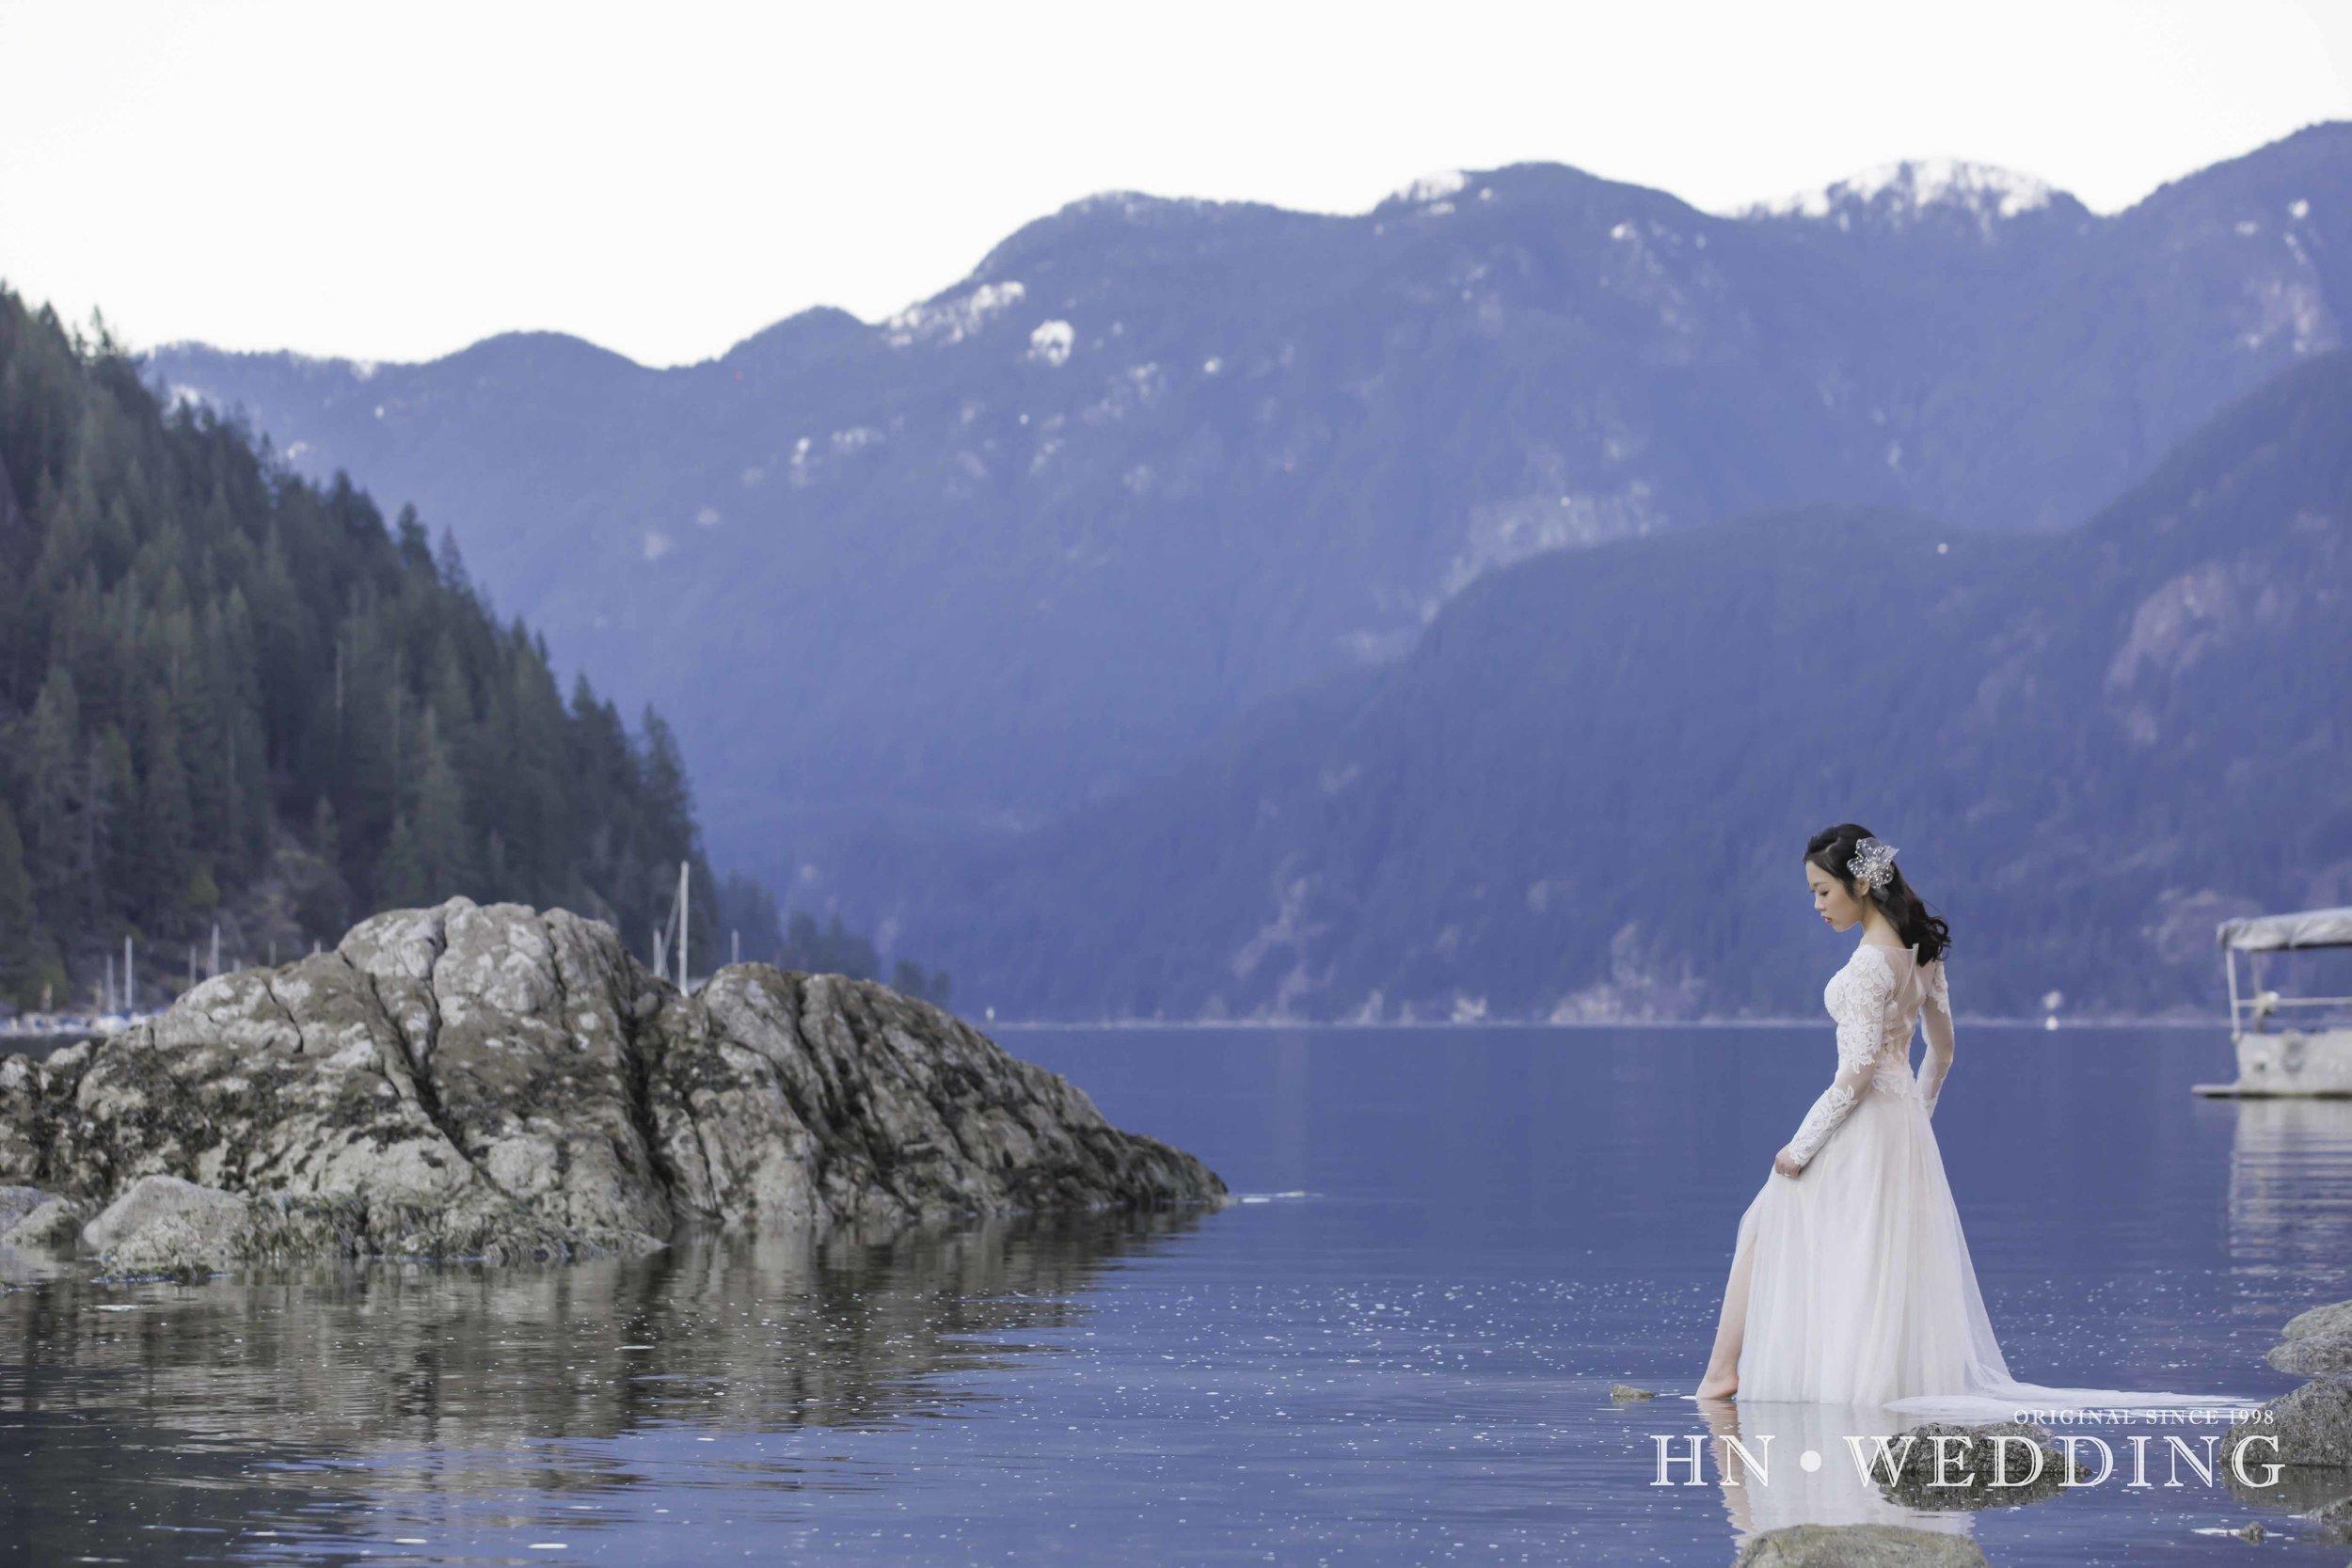 HNwedding-20170403-prewedding-0439.jpg